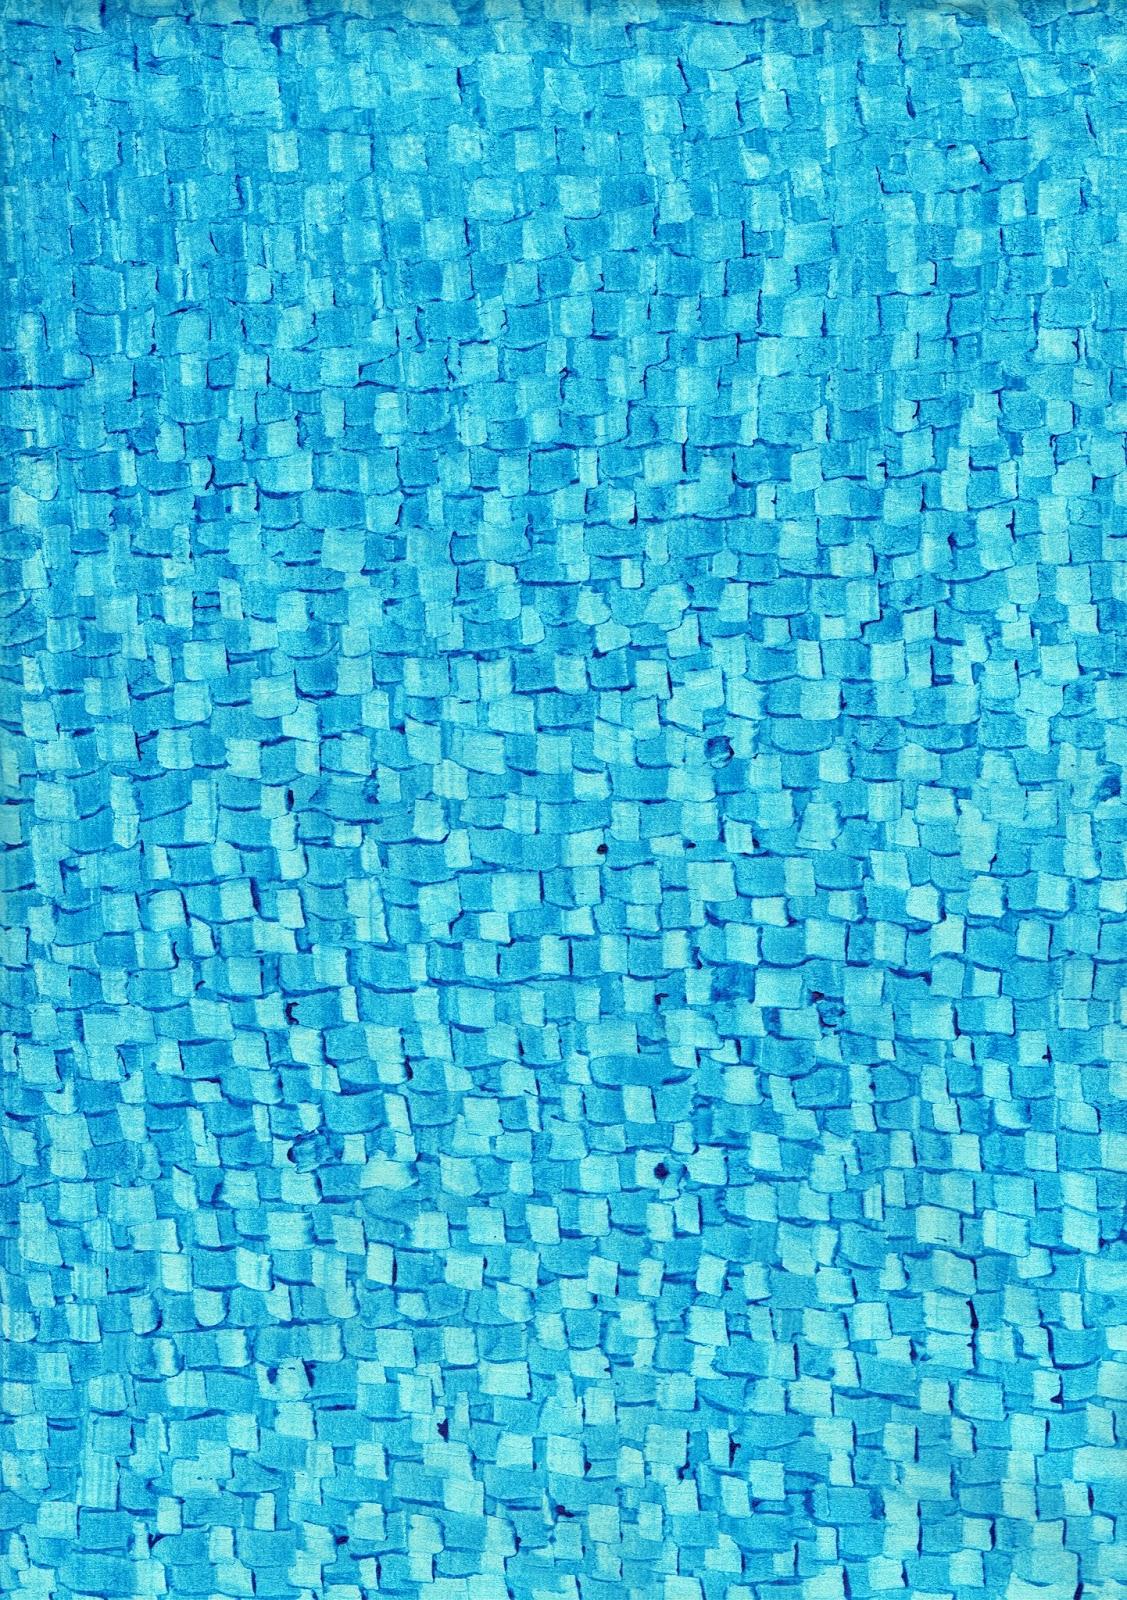 Papel al engrudo azul